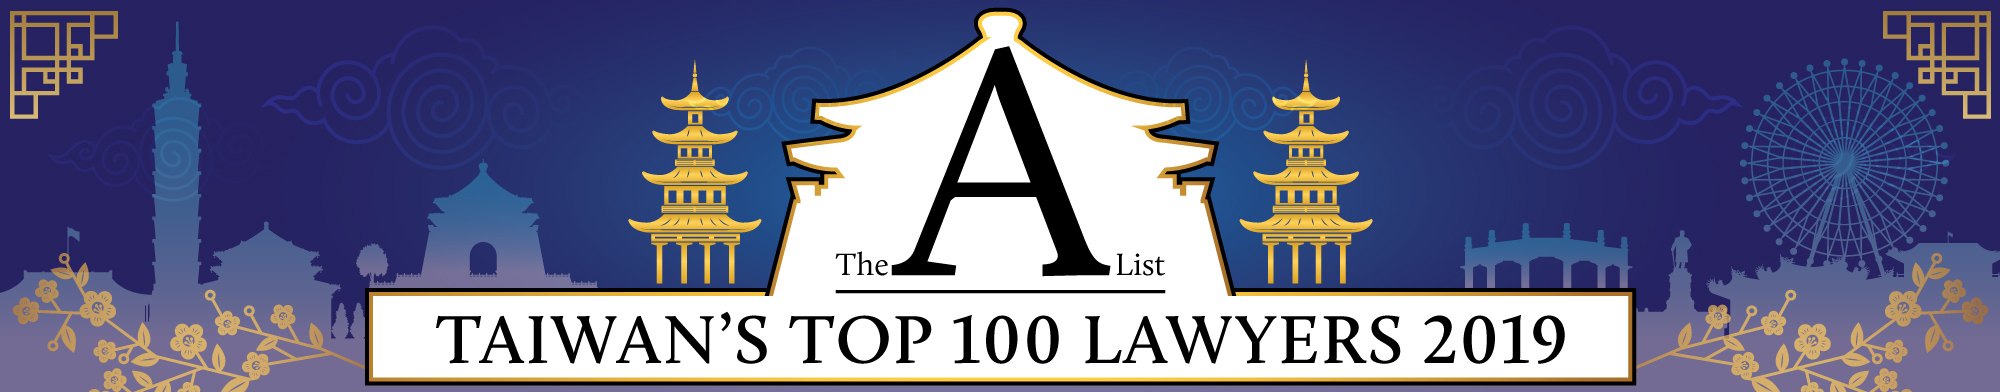 Taiwan top lawyers Taipei law firms